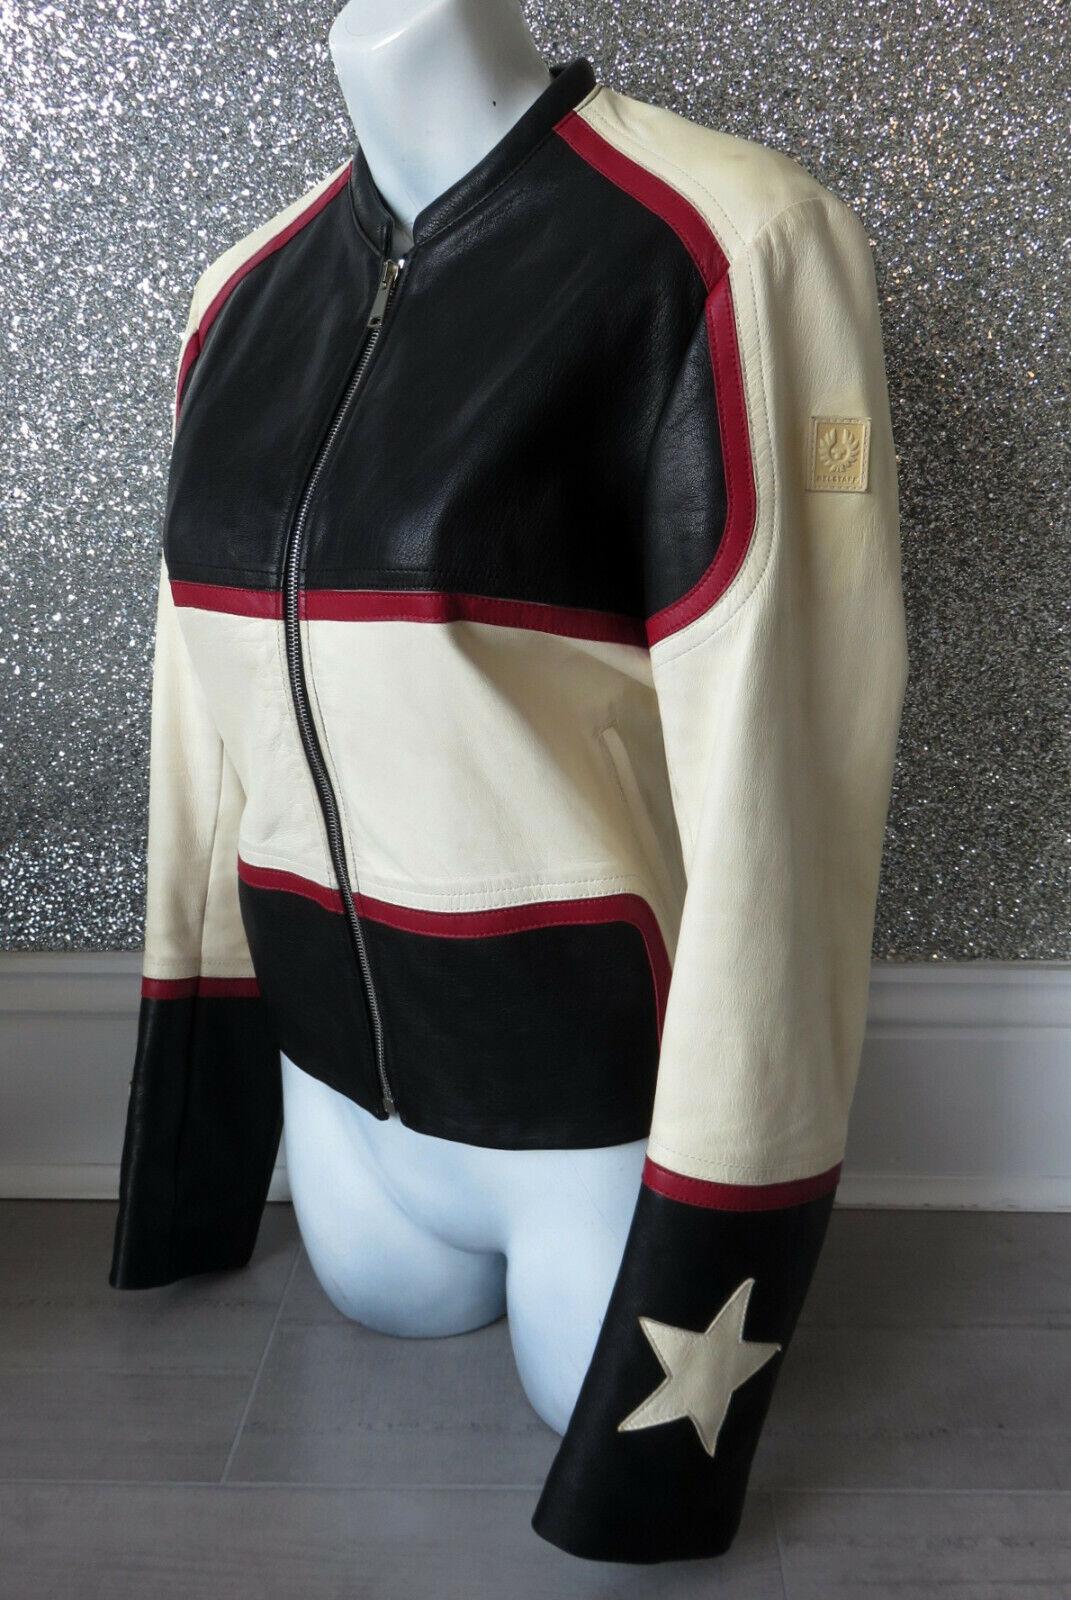 Stunning Belstaff Whitaker Star Black Red White Great Patina Leather Jacket IT42